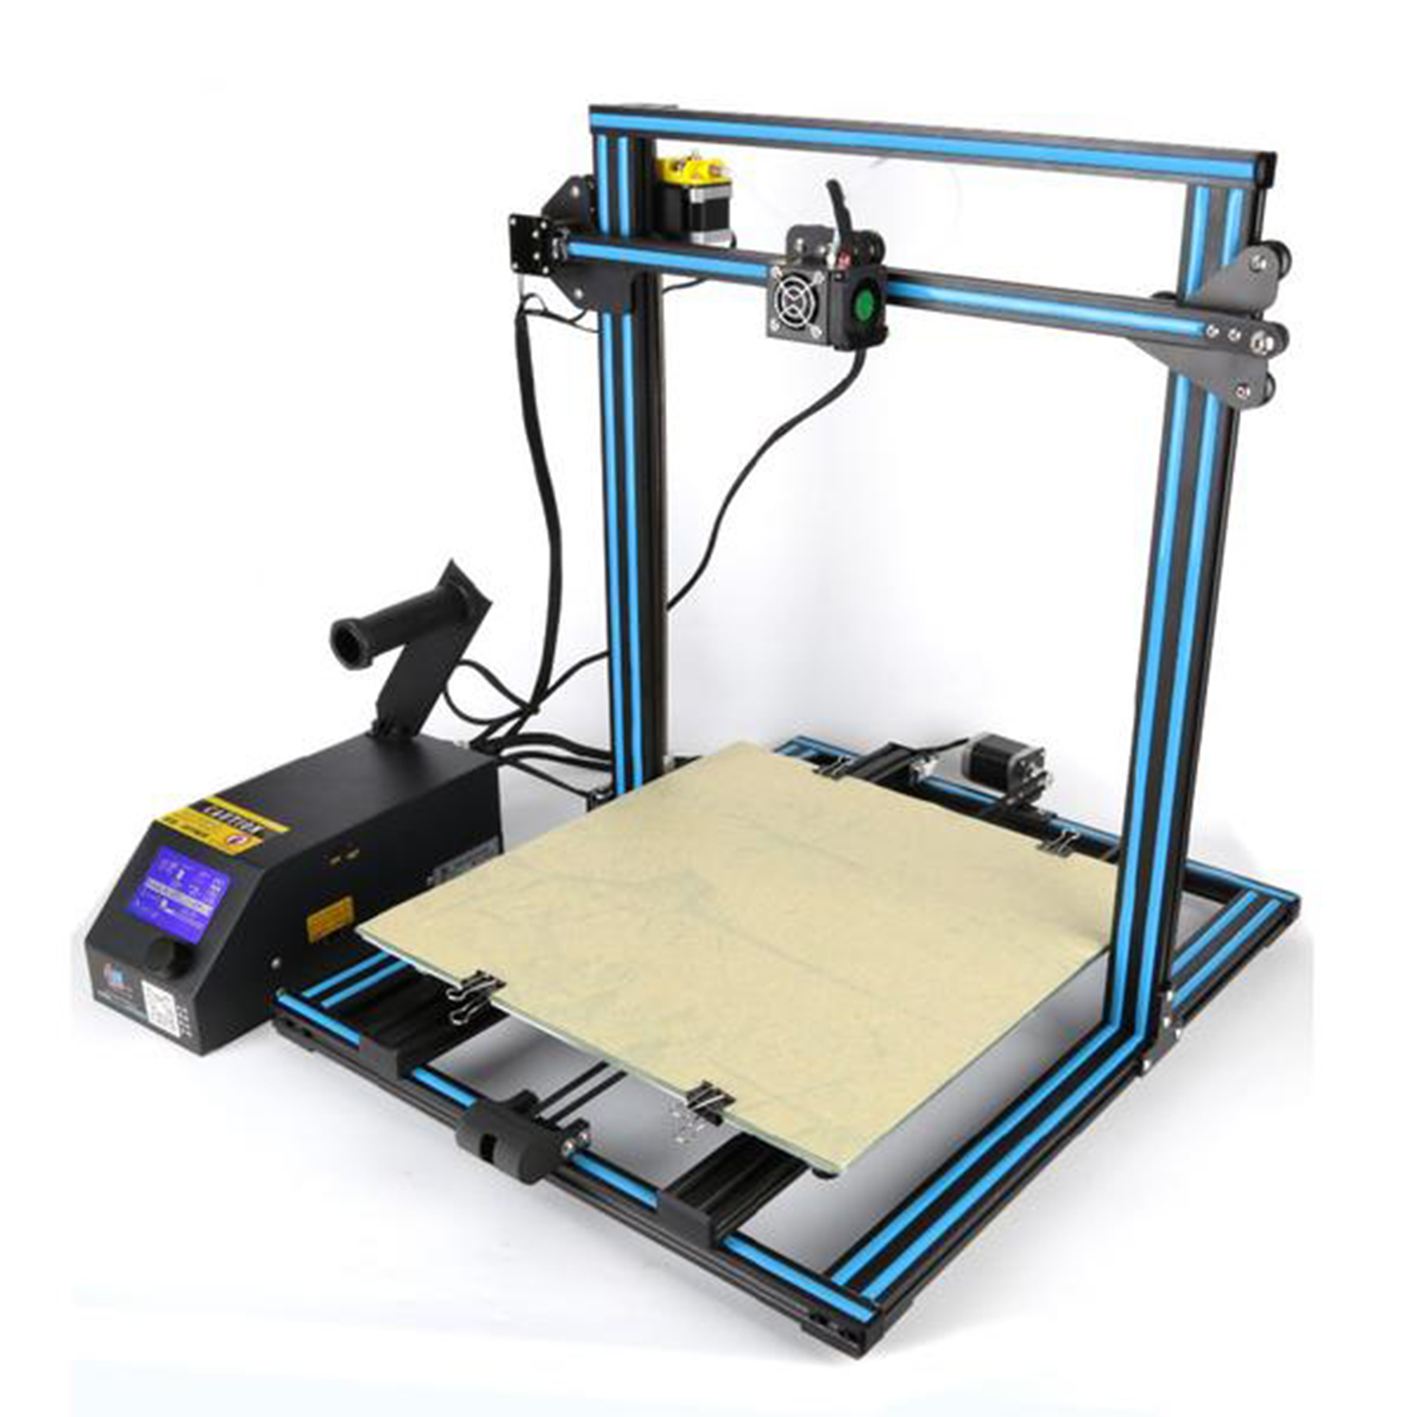 3d printer air filter - CReality3D CR10